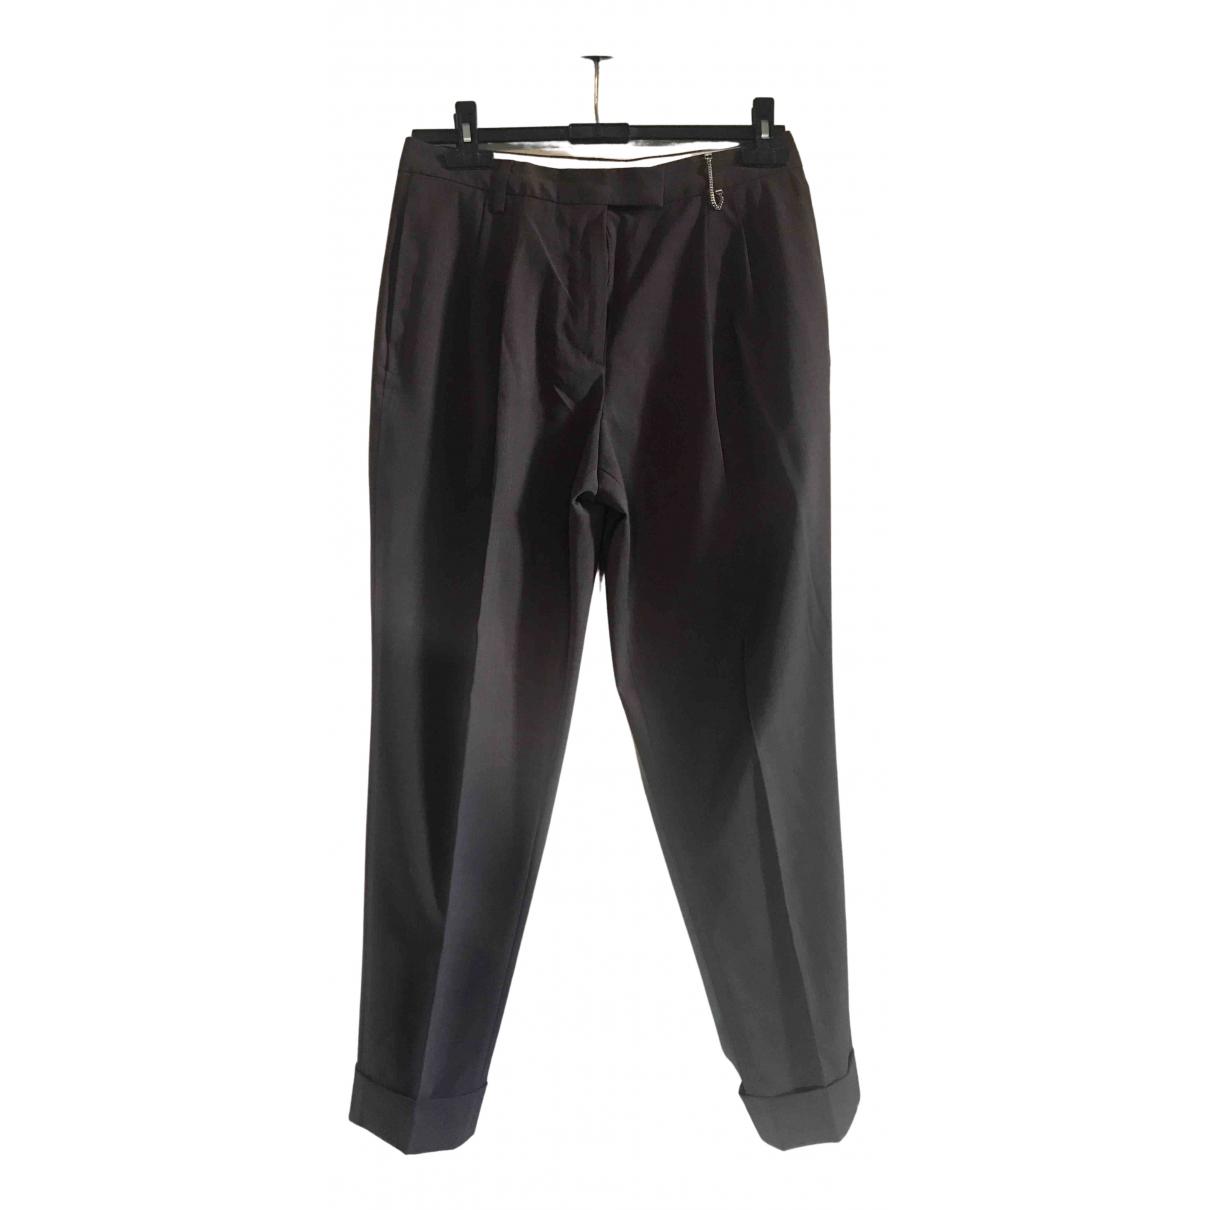 Paul Smith N Brown Wool Trousers for Women 42 IT